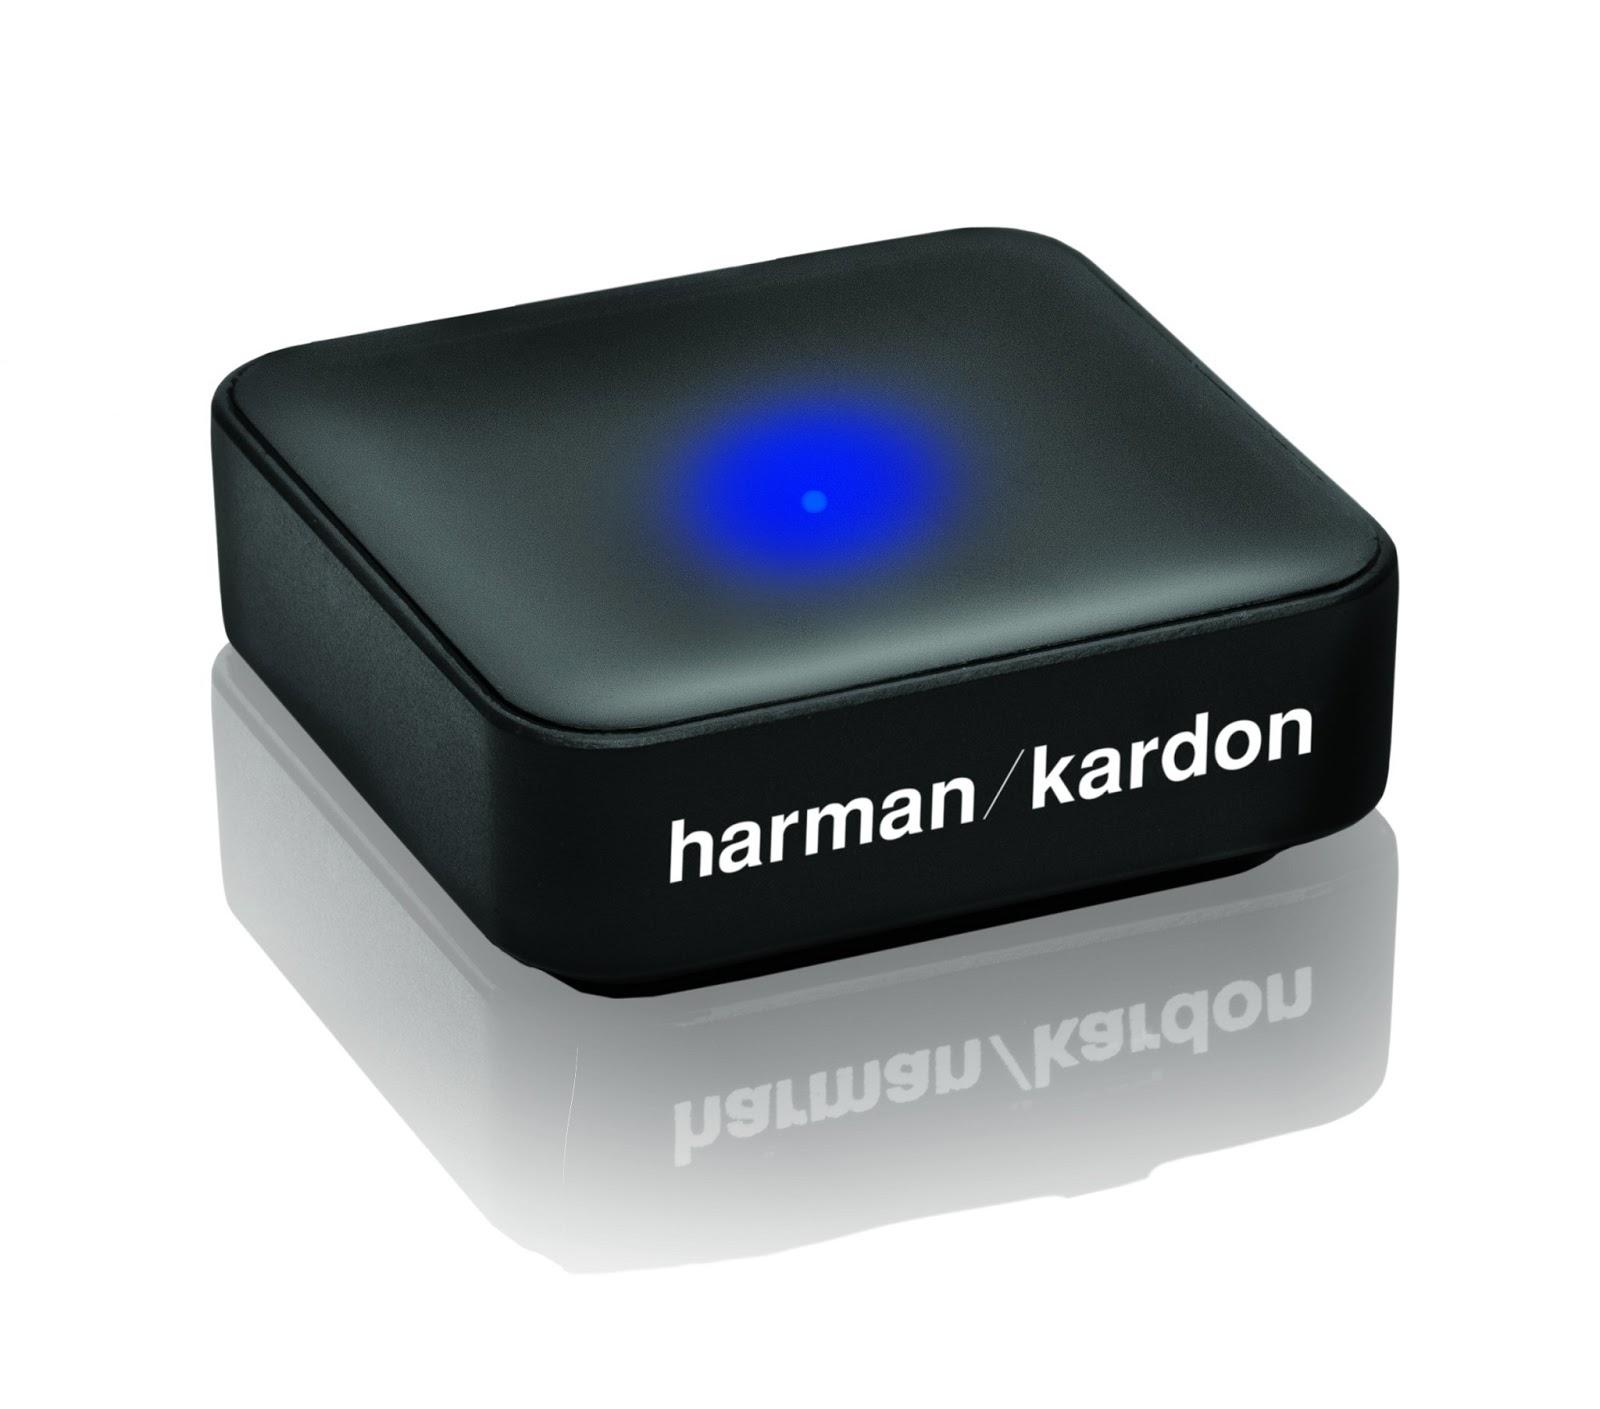 harman kardon bta 10 external bluetooth adapter reviews. Black Bedroom Furniture Sets. Home Design Ideas